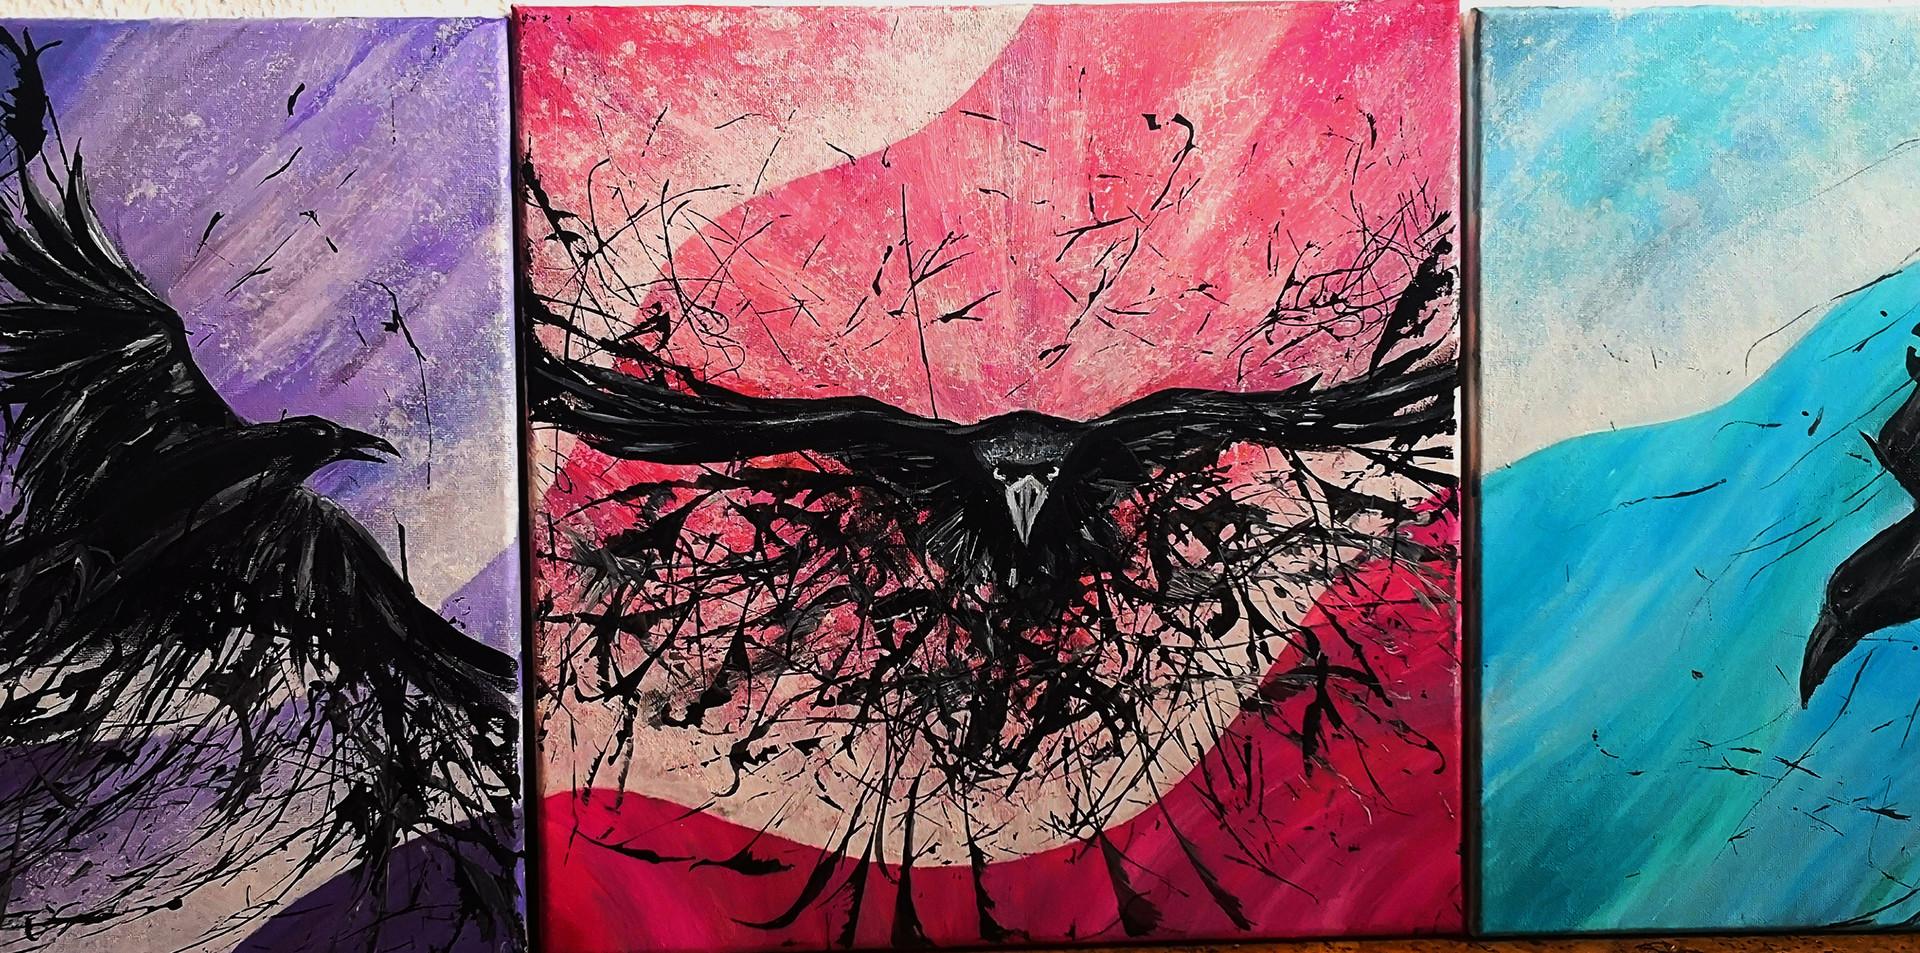 Power of Ravens/Nicht verfügbar